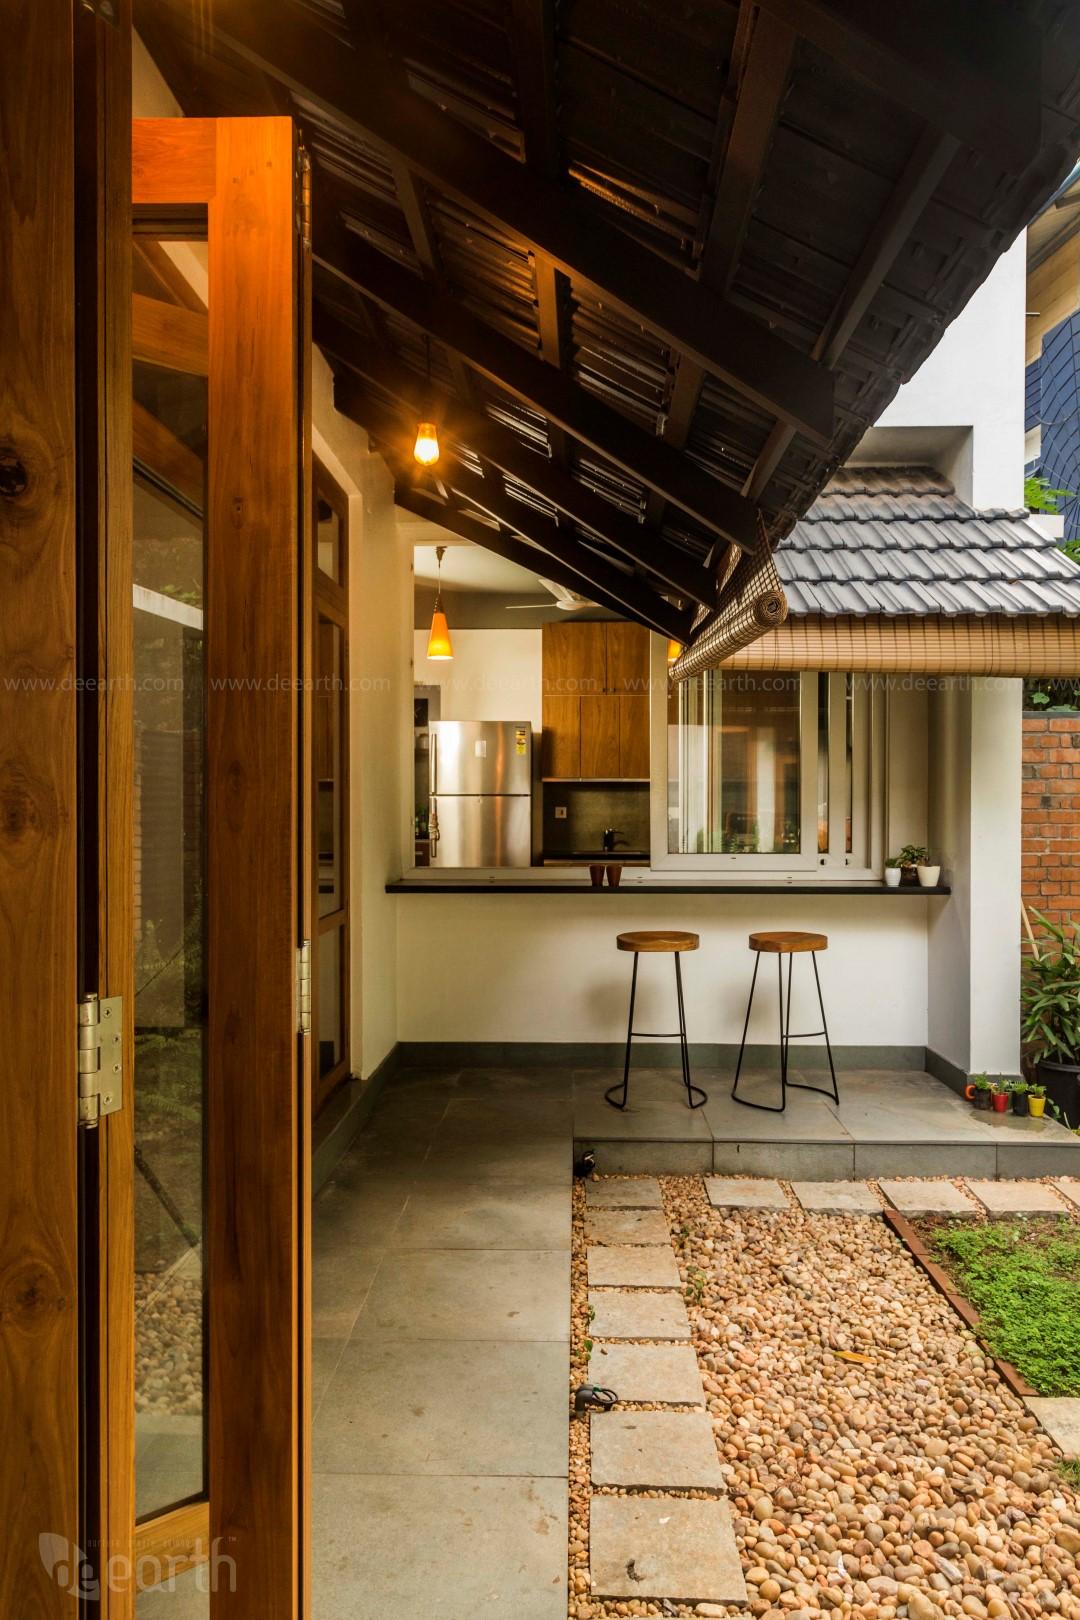 The Garden House Calicut De Earth The Architects Diary